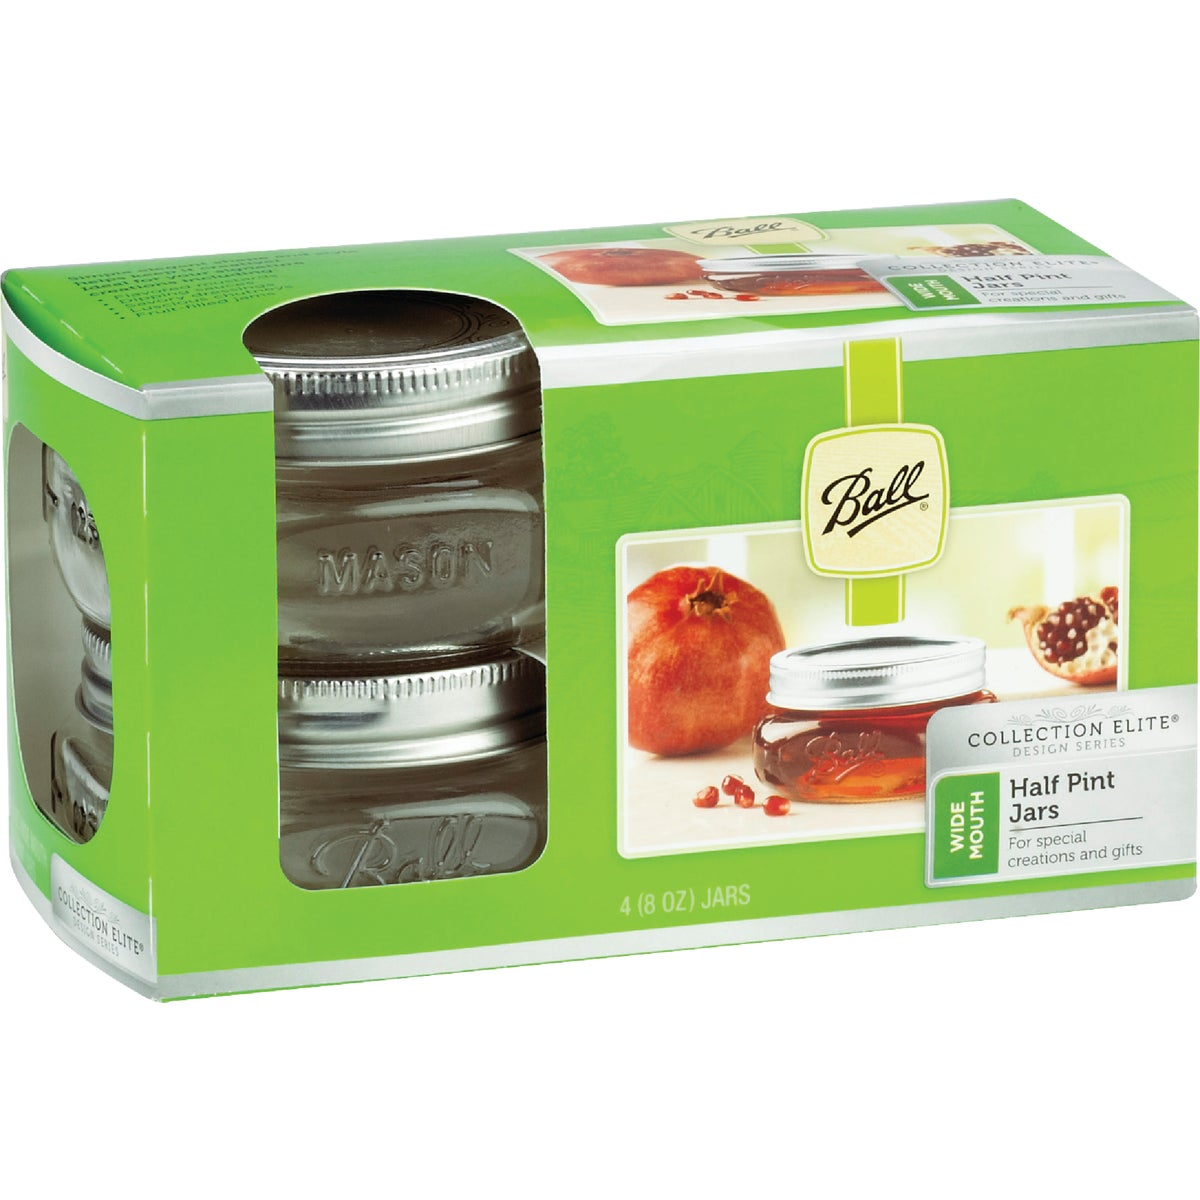 Jarden Home Brands 4 1/2PT W/M JAR 1440061162